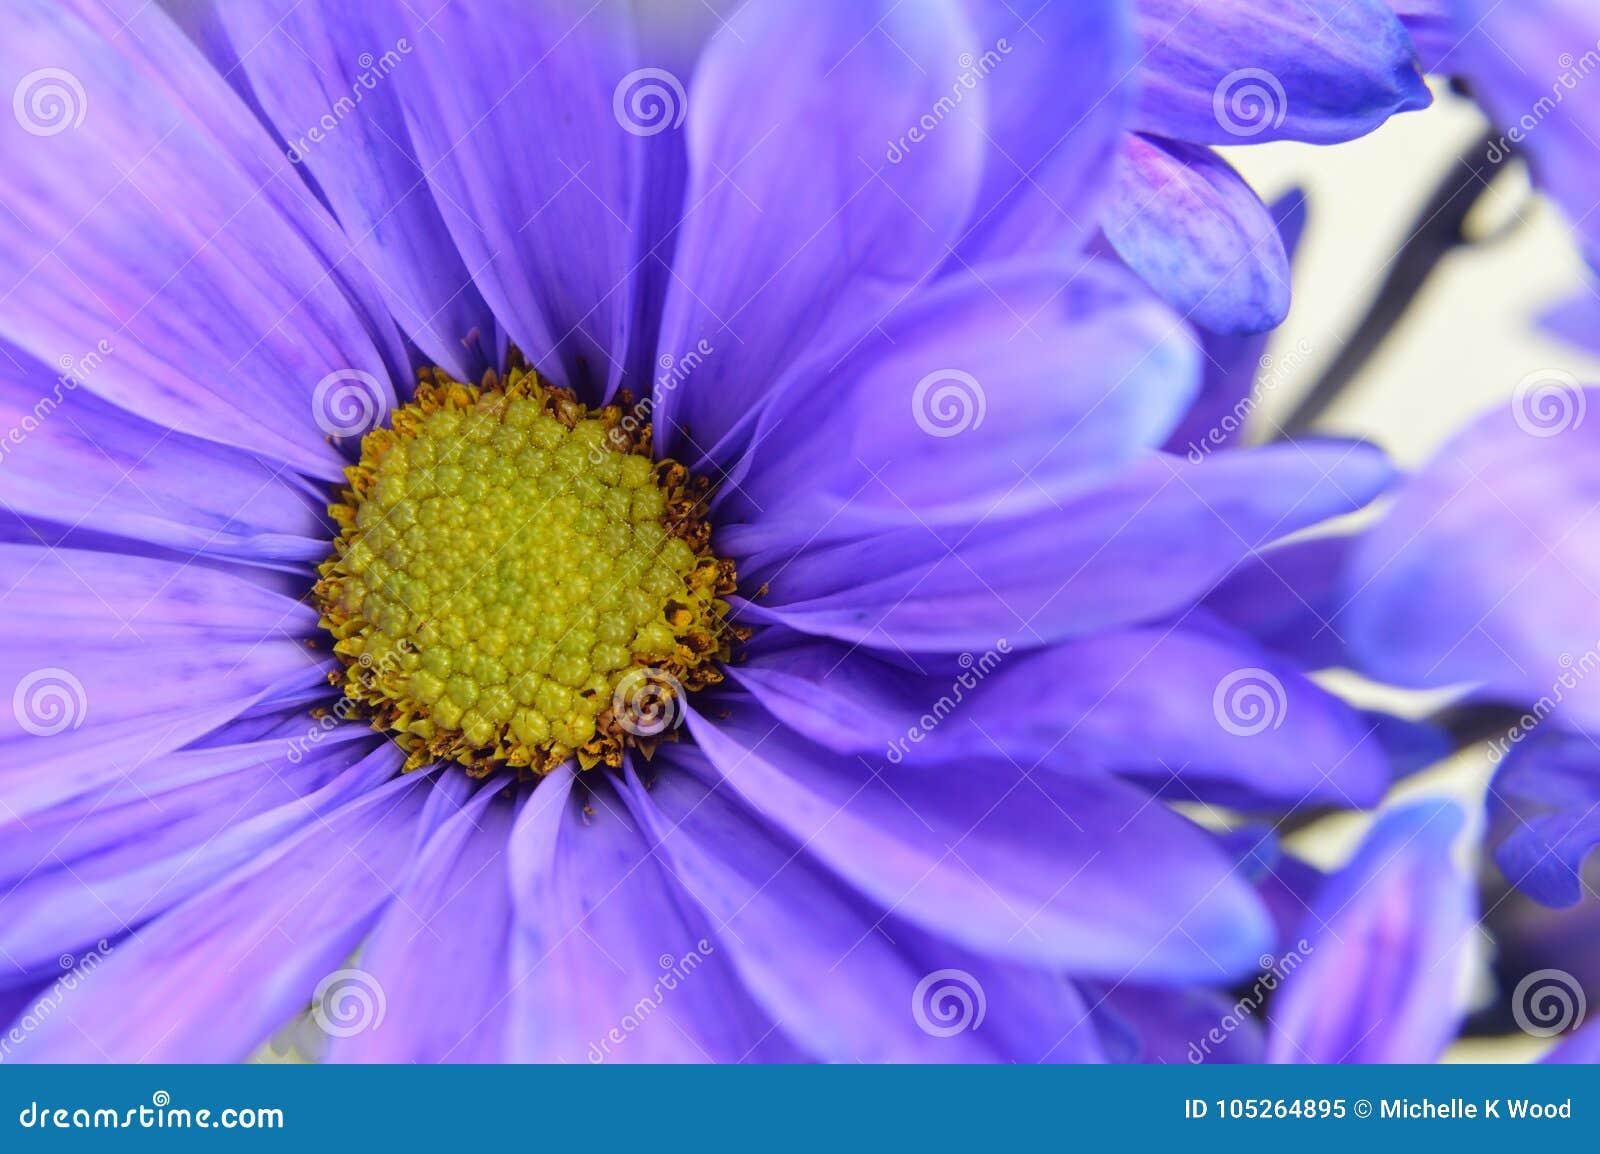 Blue Daisy with Yellow Center Flower Closeup